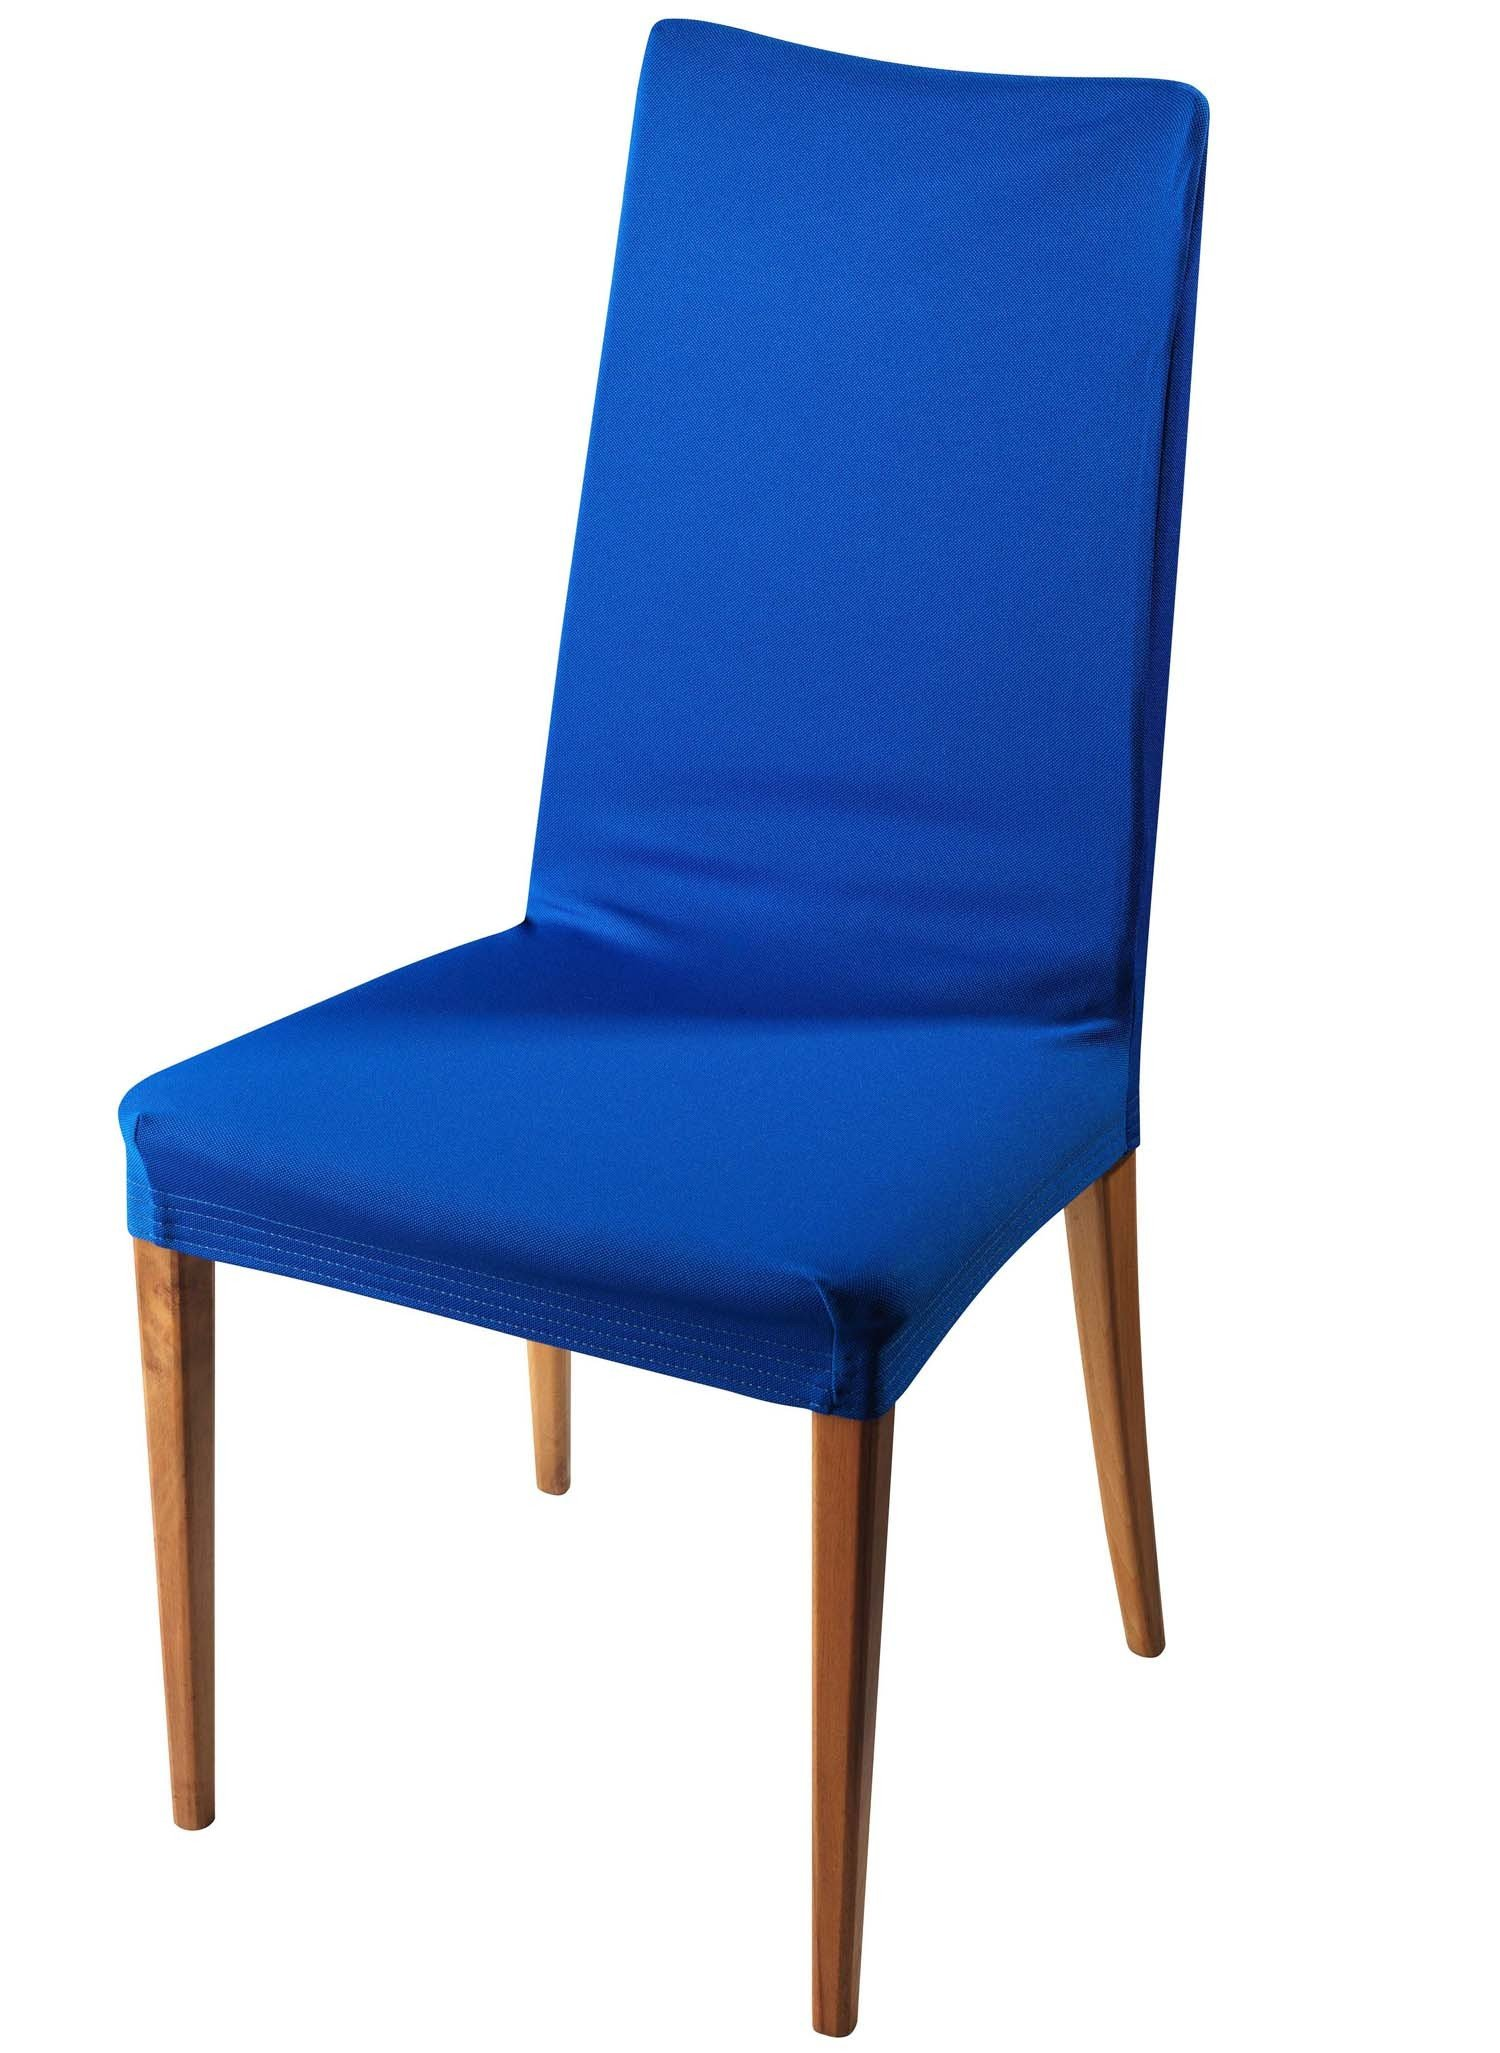 Schonbezug,Stühle k'blau 2St. - 1 - Ronja.ch